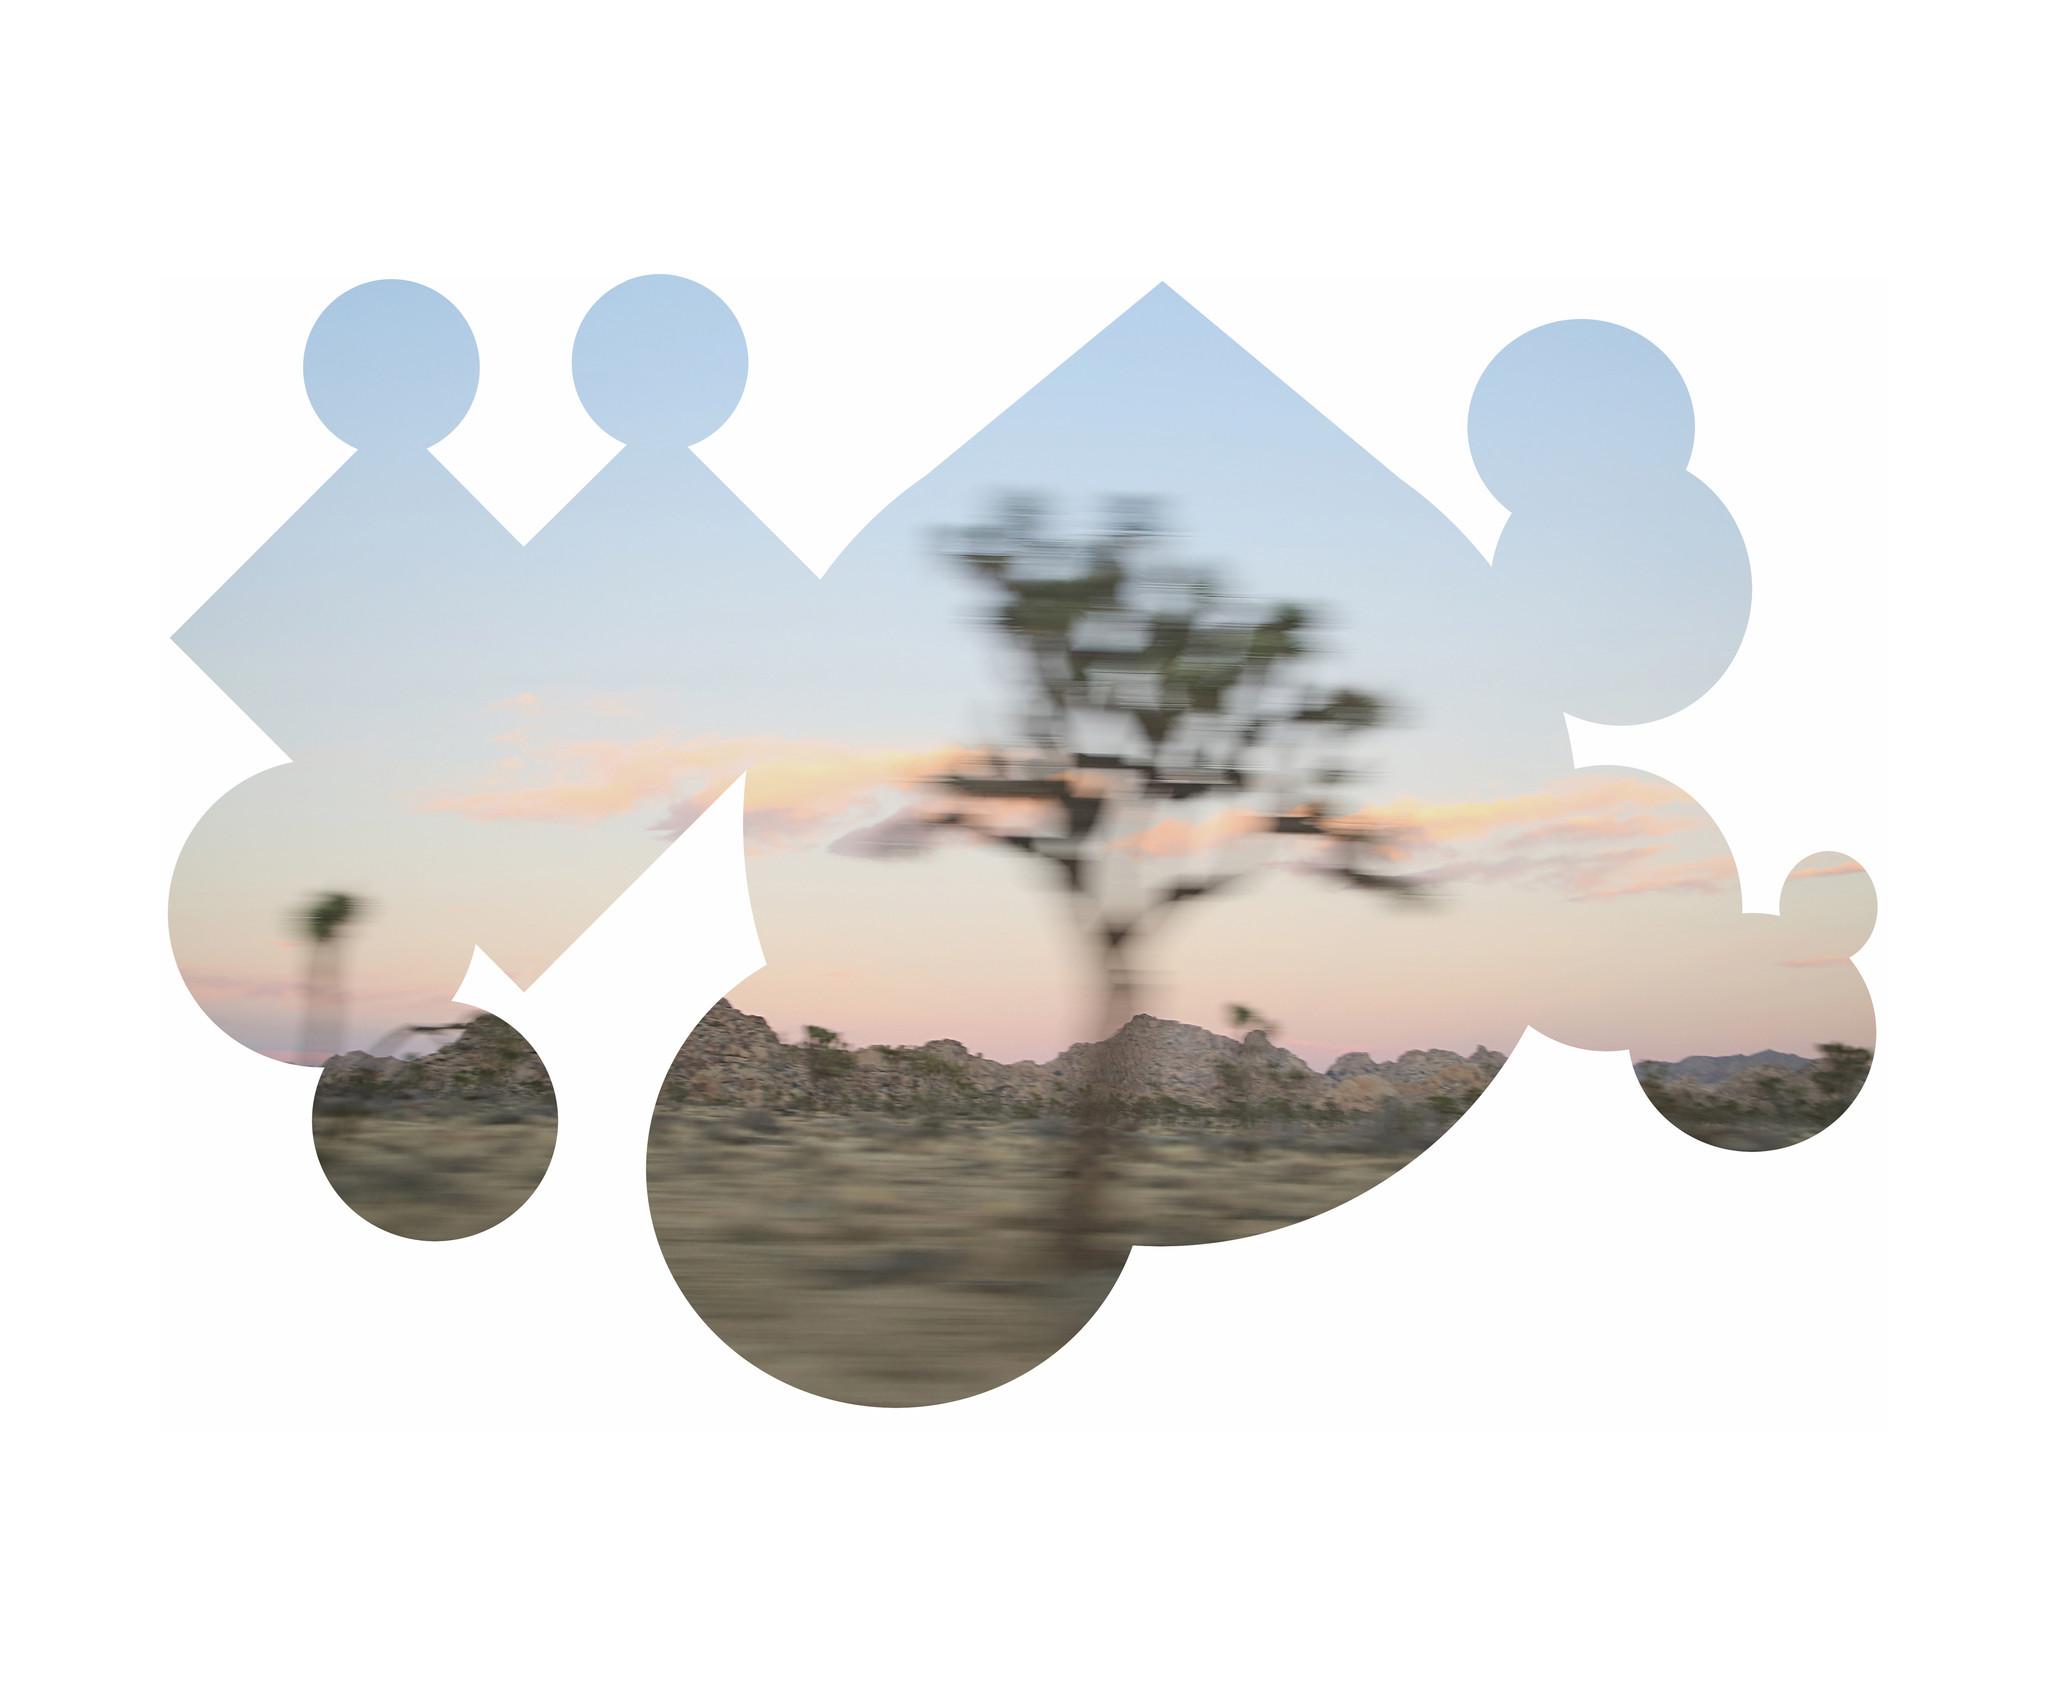 Benjy Russell portal/joshua tree #1